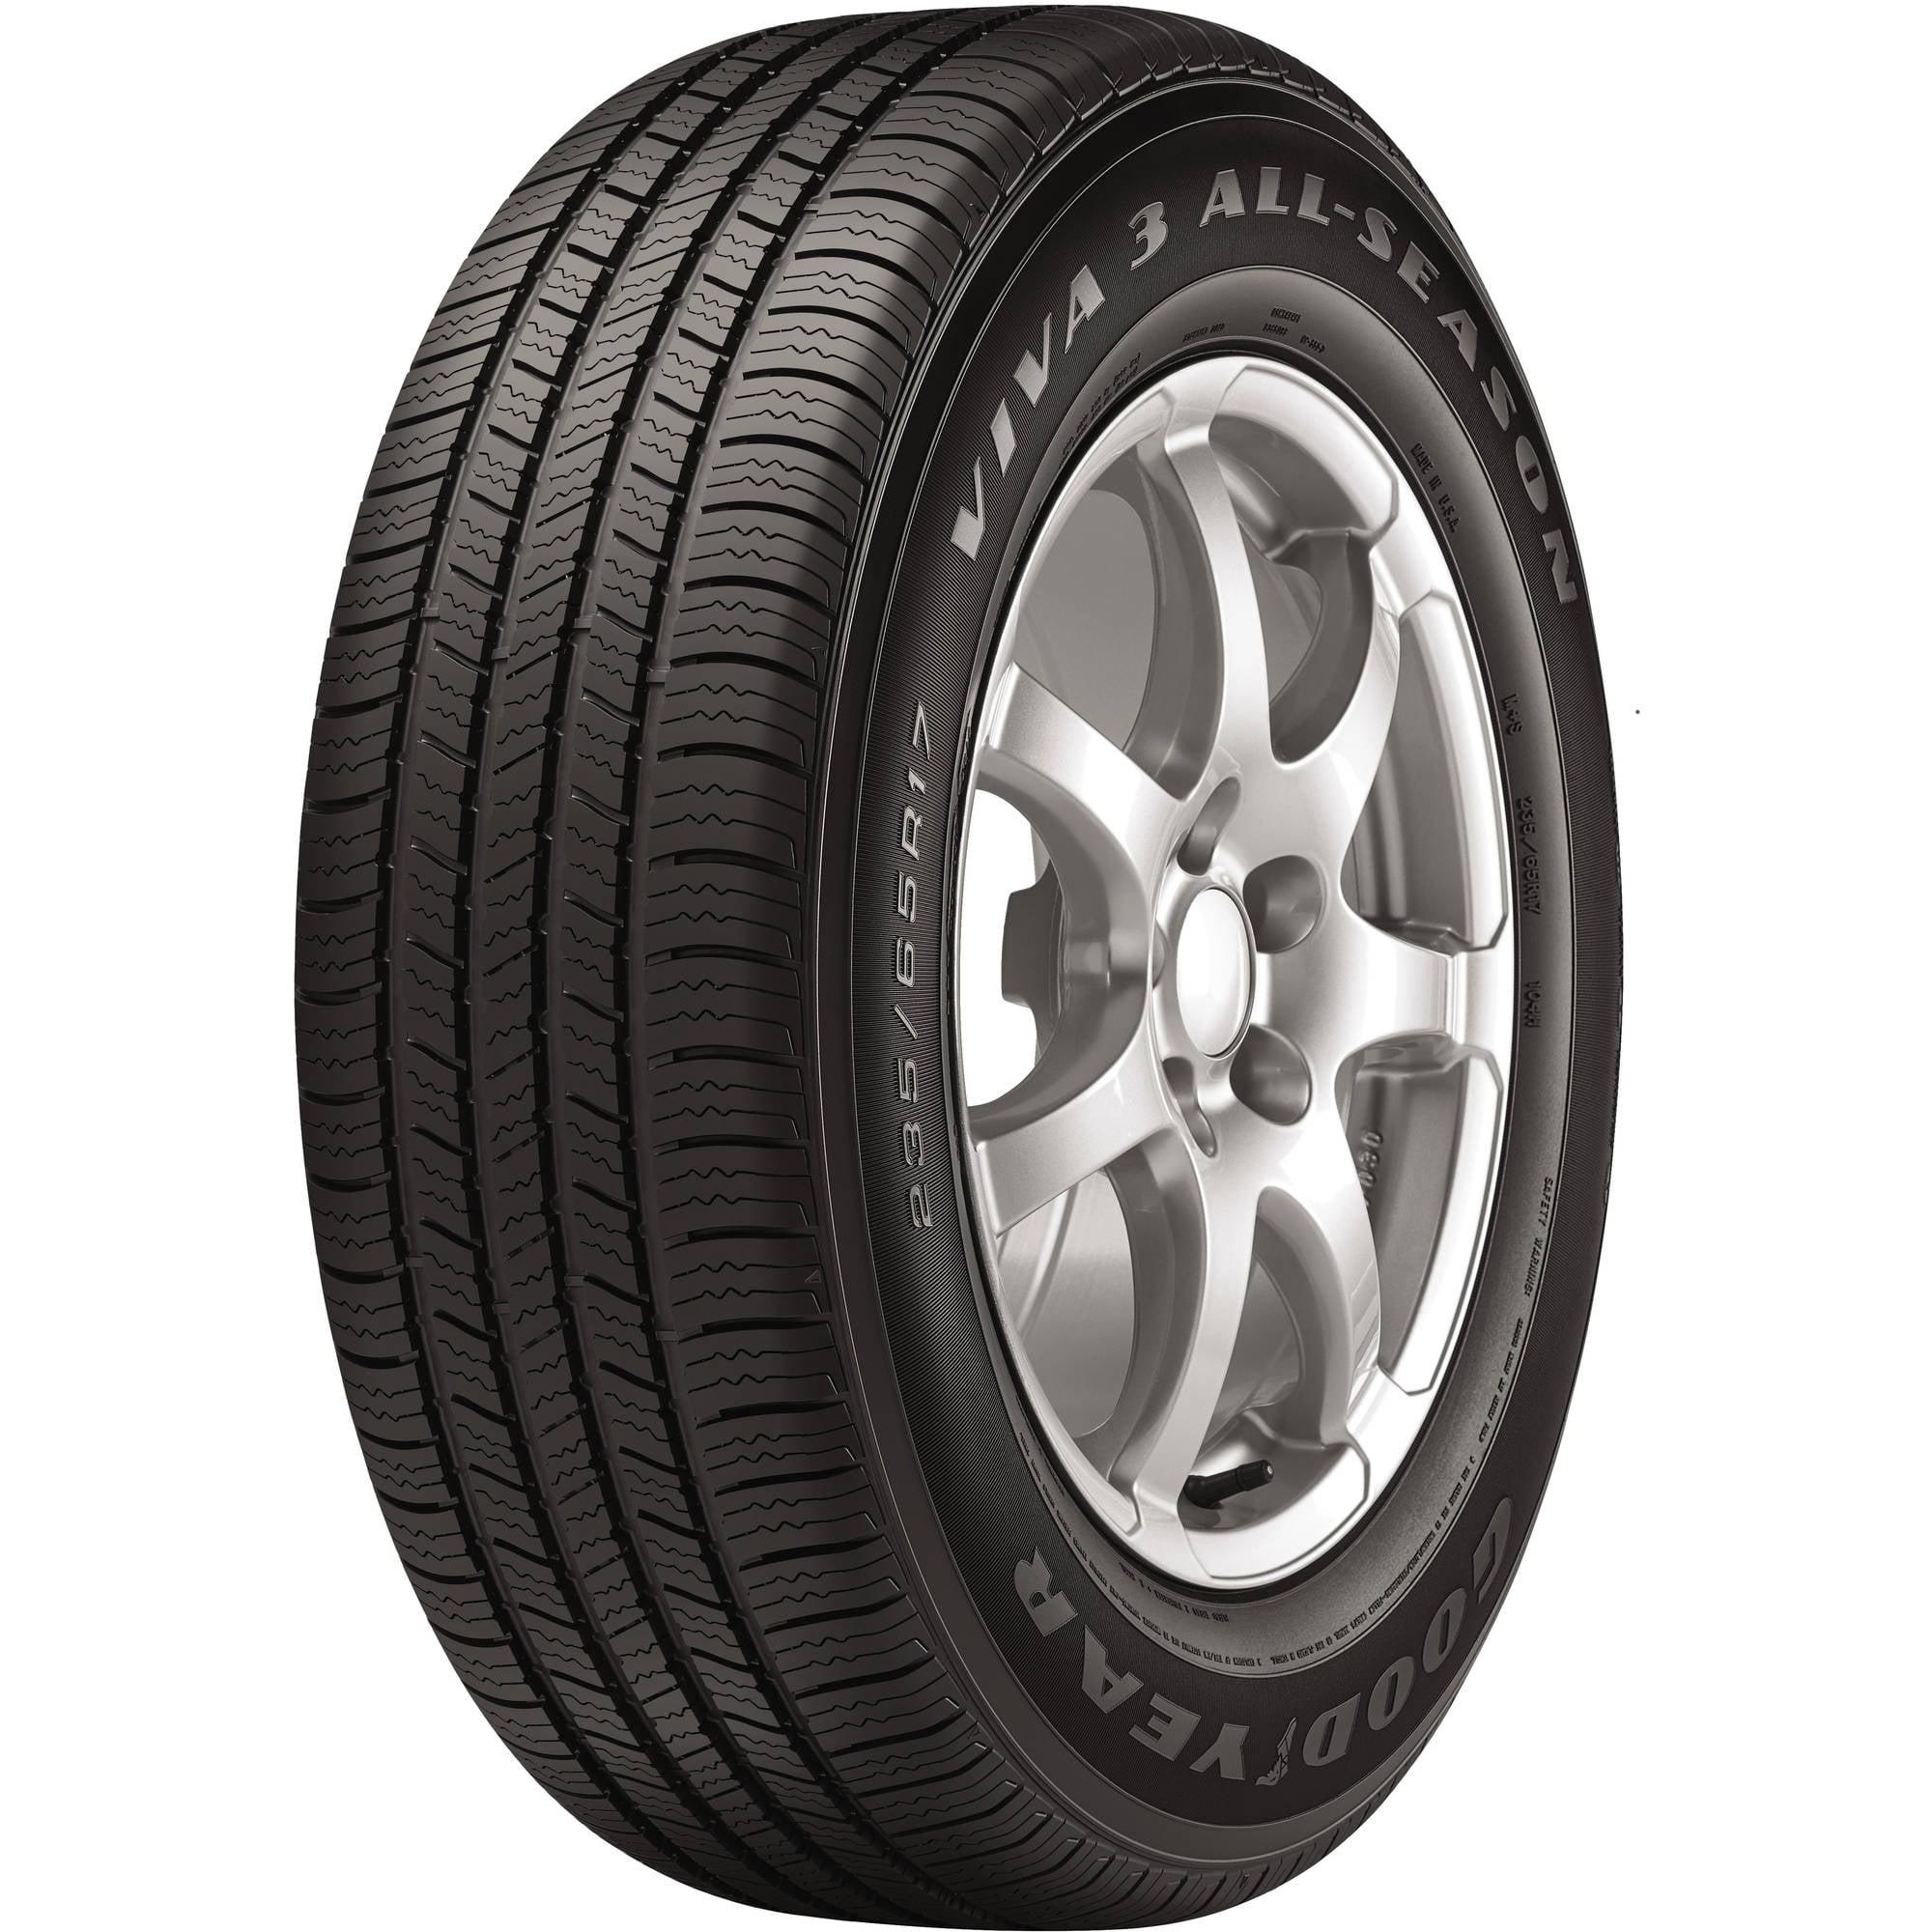 Best All Season Tires >> Goodyear Viva 3 All Season Tire 225 60r17 99h